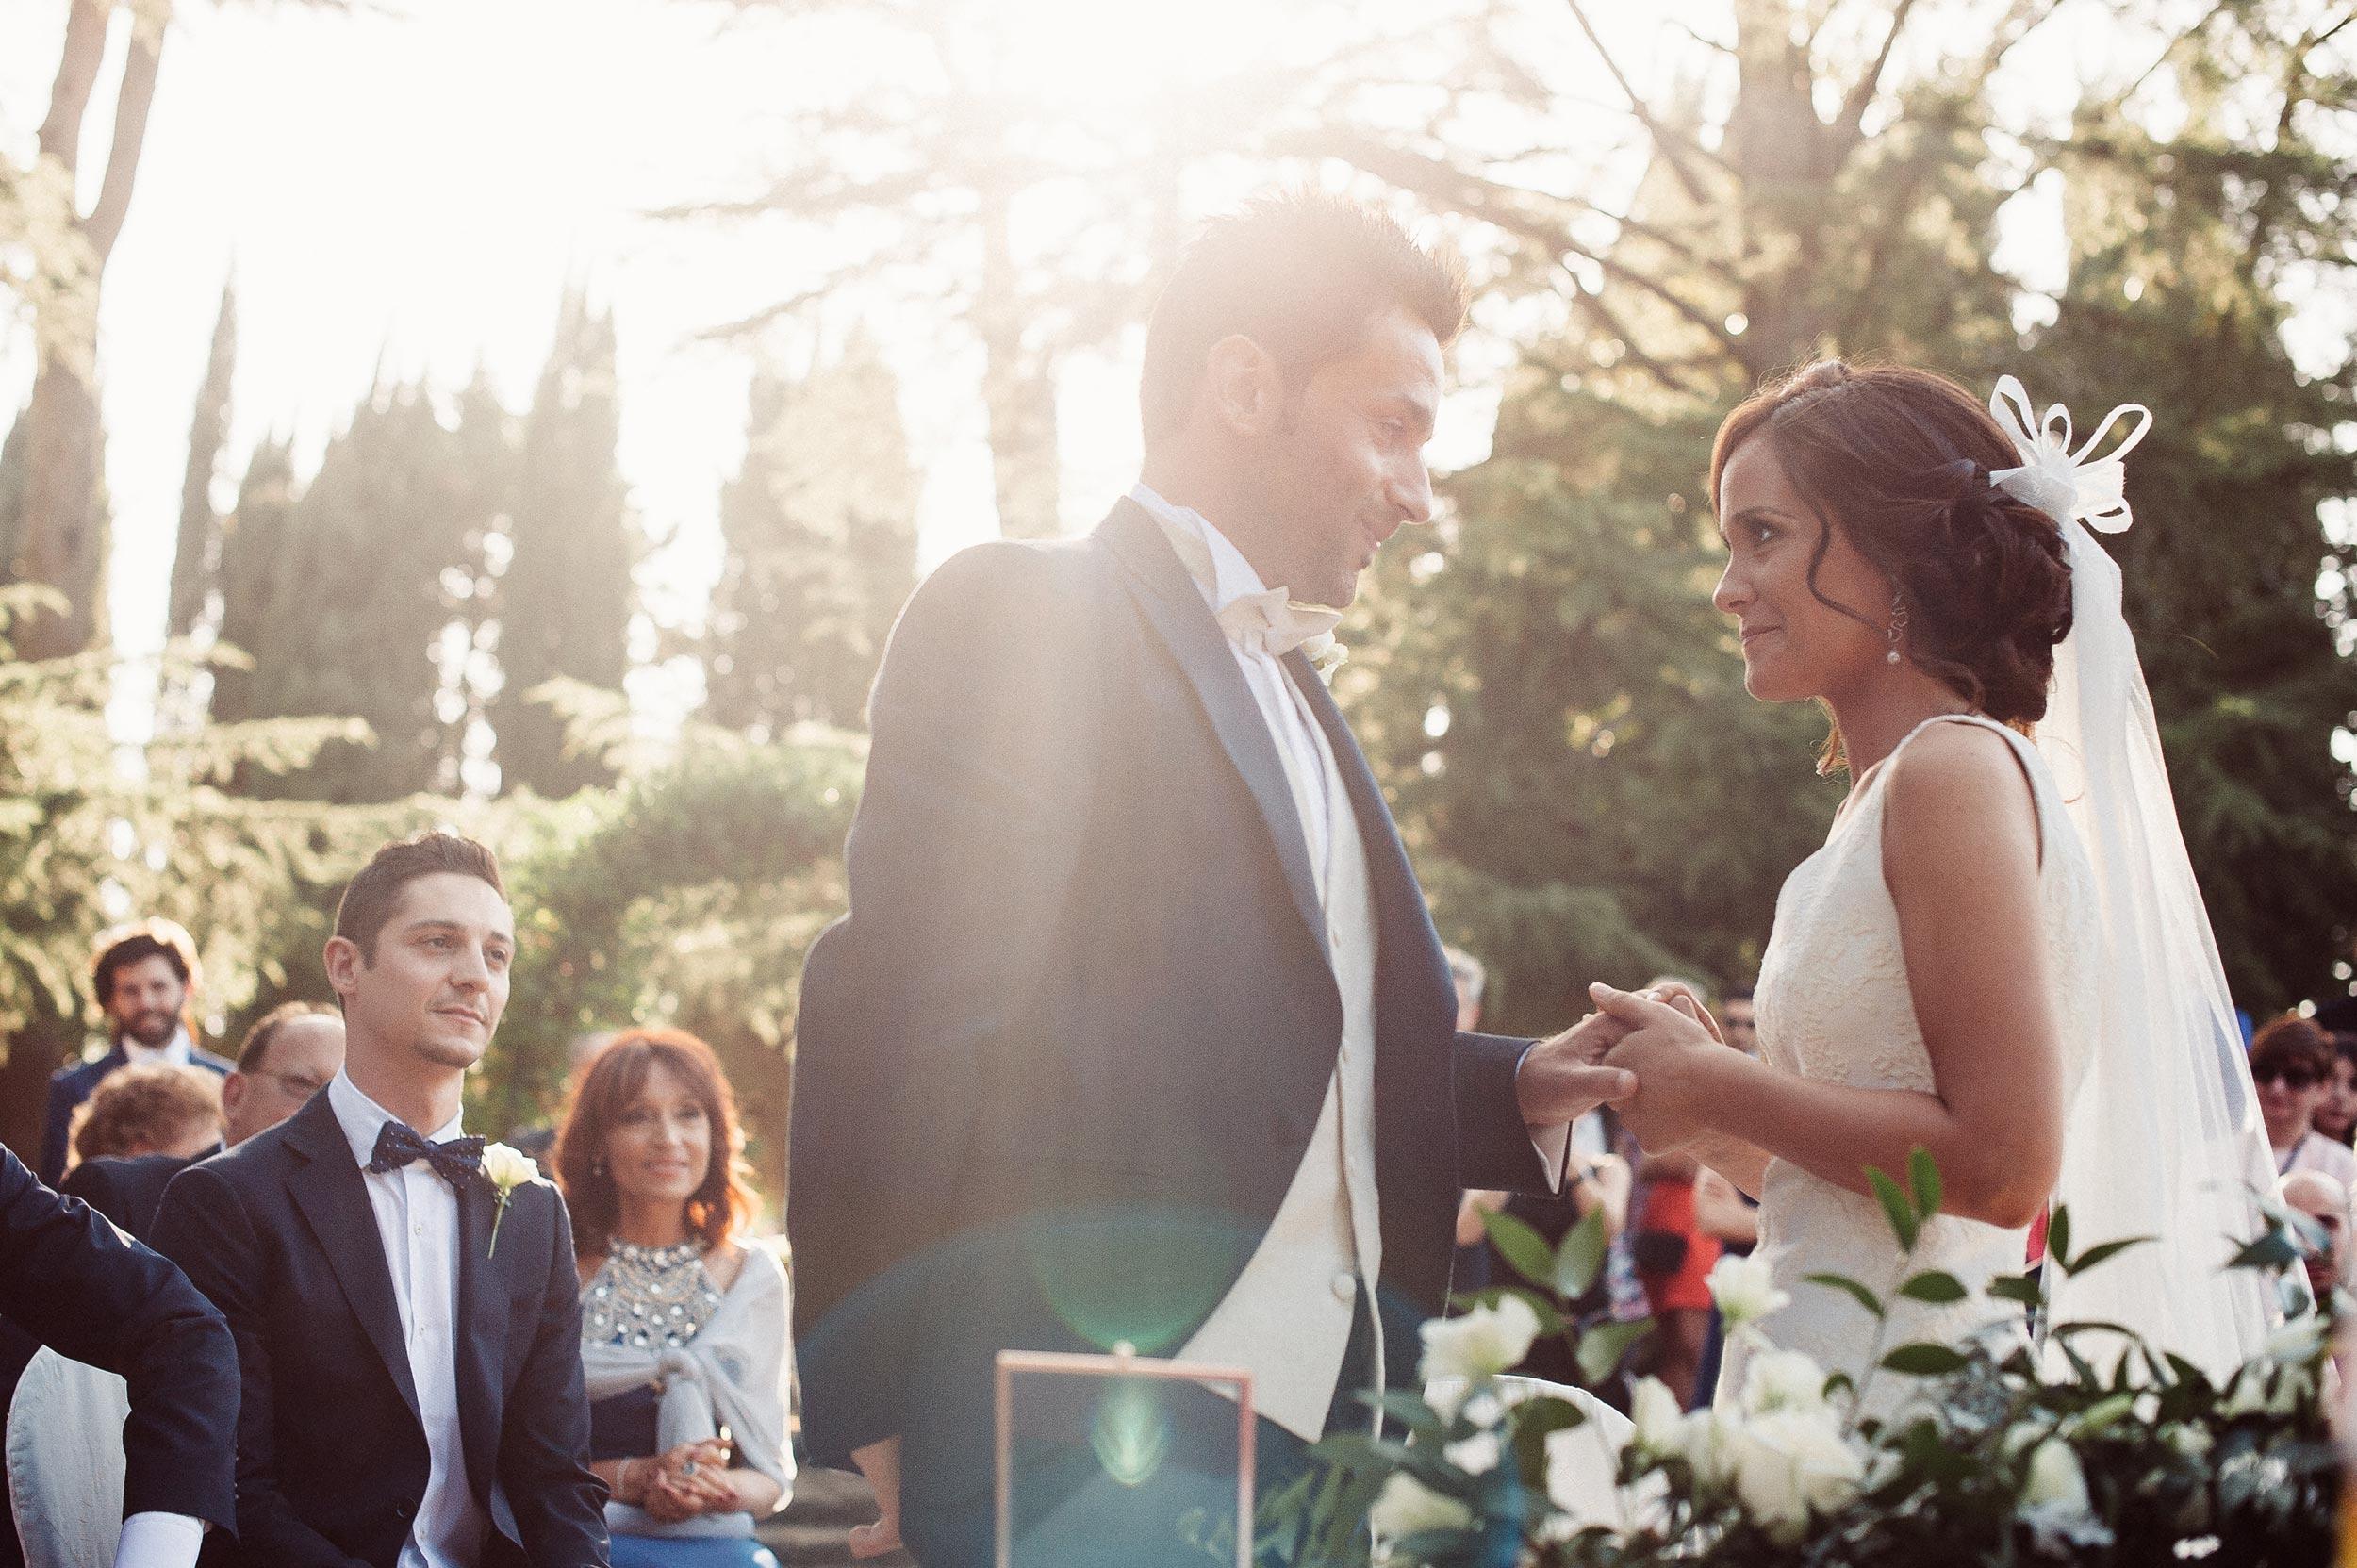 beautiful-wedding-in-italy-flare-strikes-during-ring-exchange.jpg